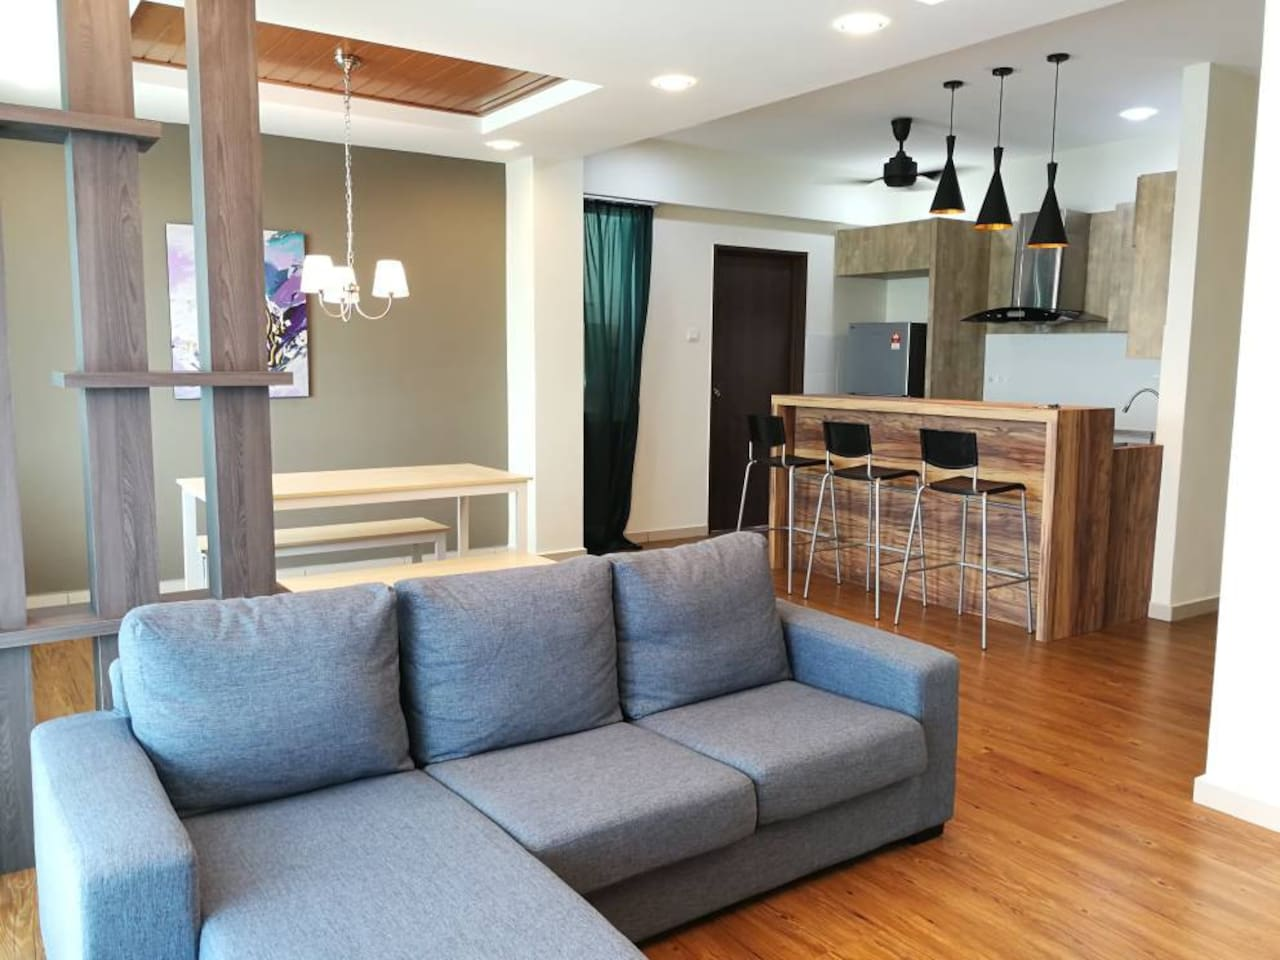 3 bedroom spacious condominium full furnished at Autocity, Penang. 1426 sq feet.